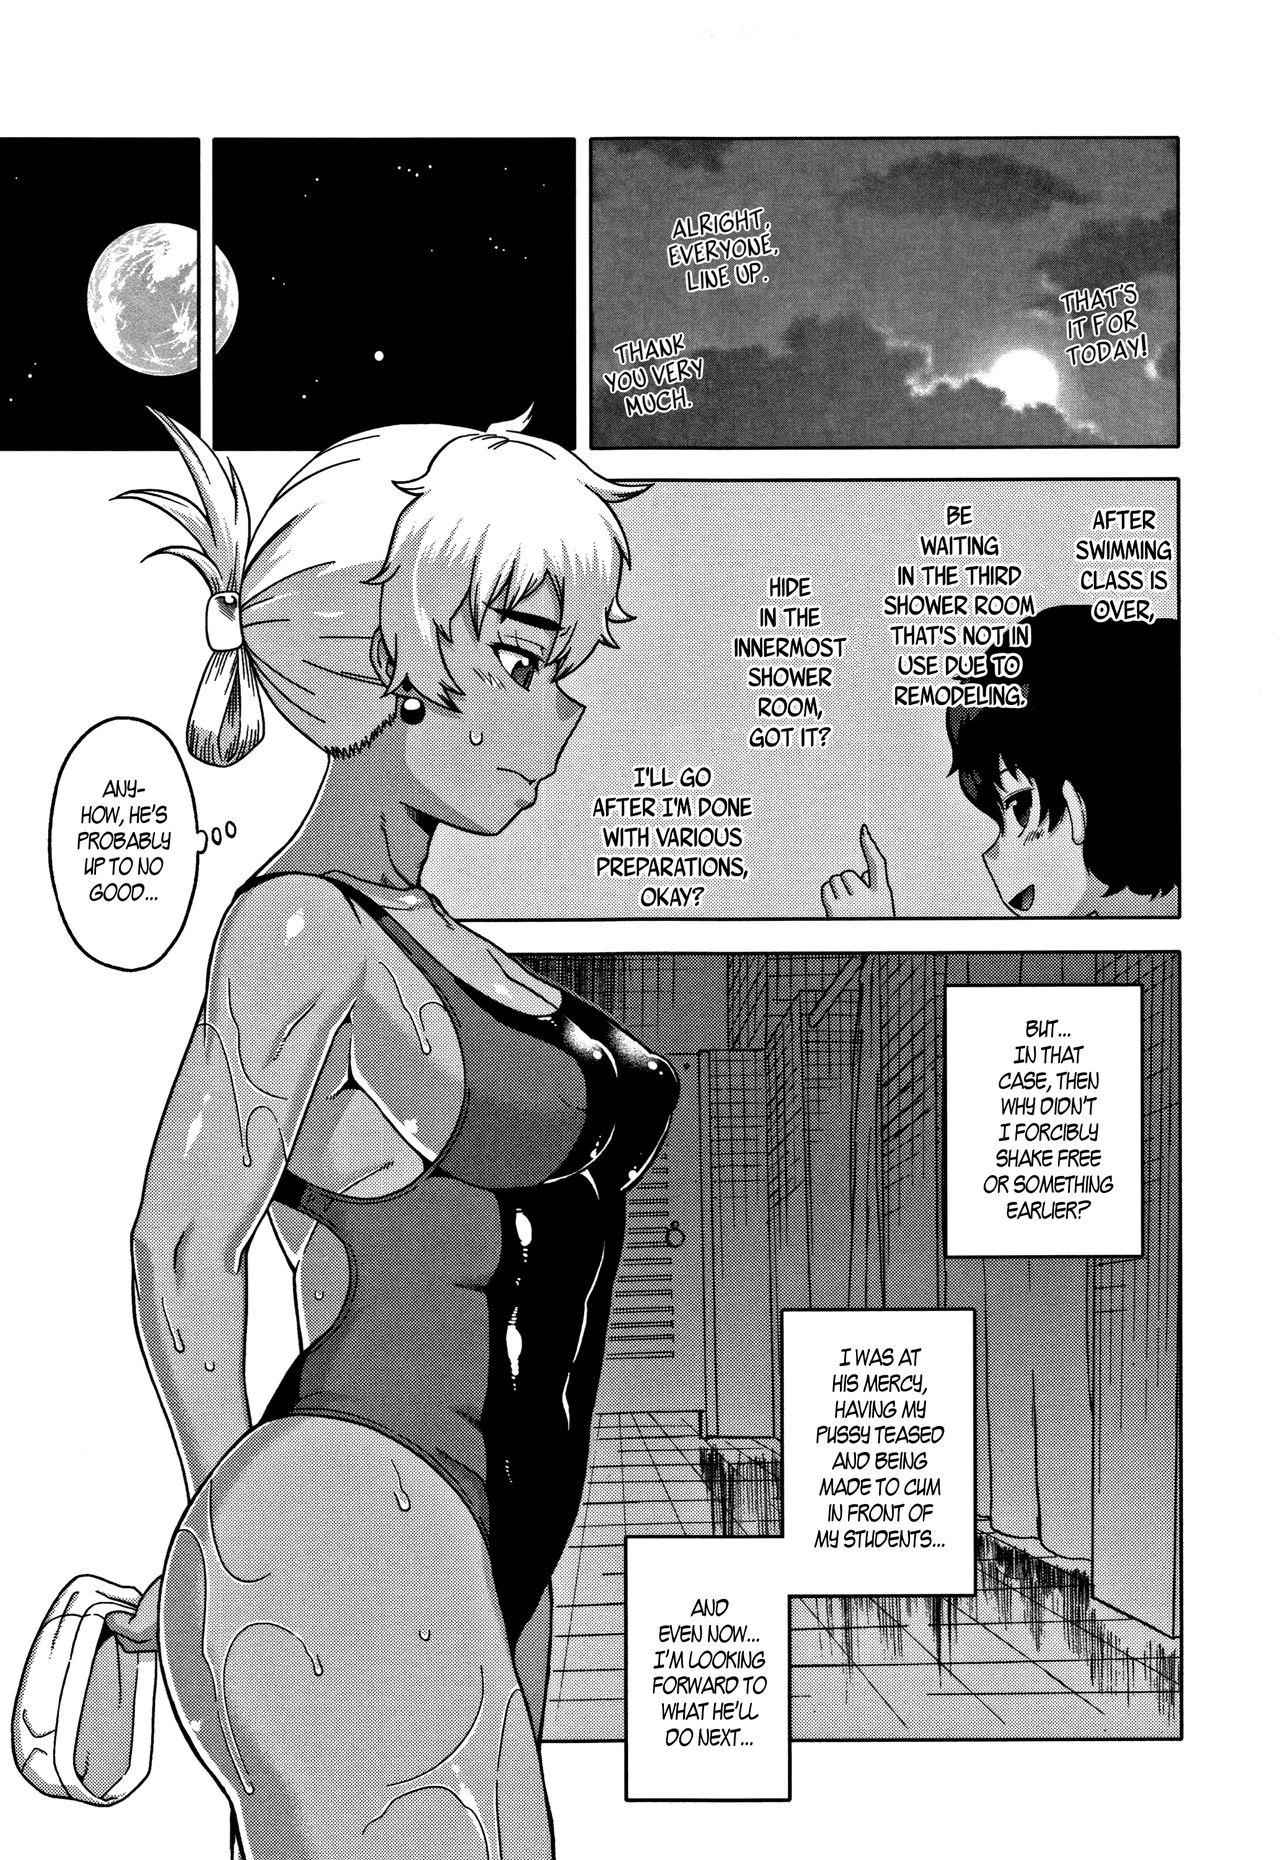 [Takatsu] Hitozuma A-san to Musuko no Yuujin N-kun - Married wife A and son's friend N-kun [English] 115